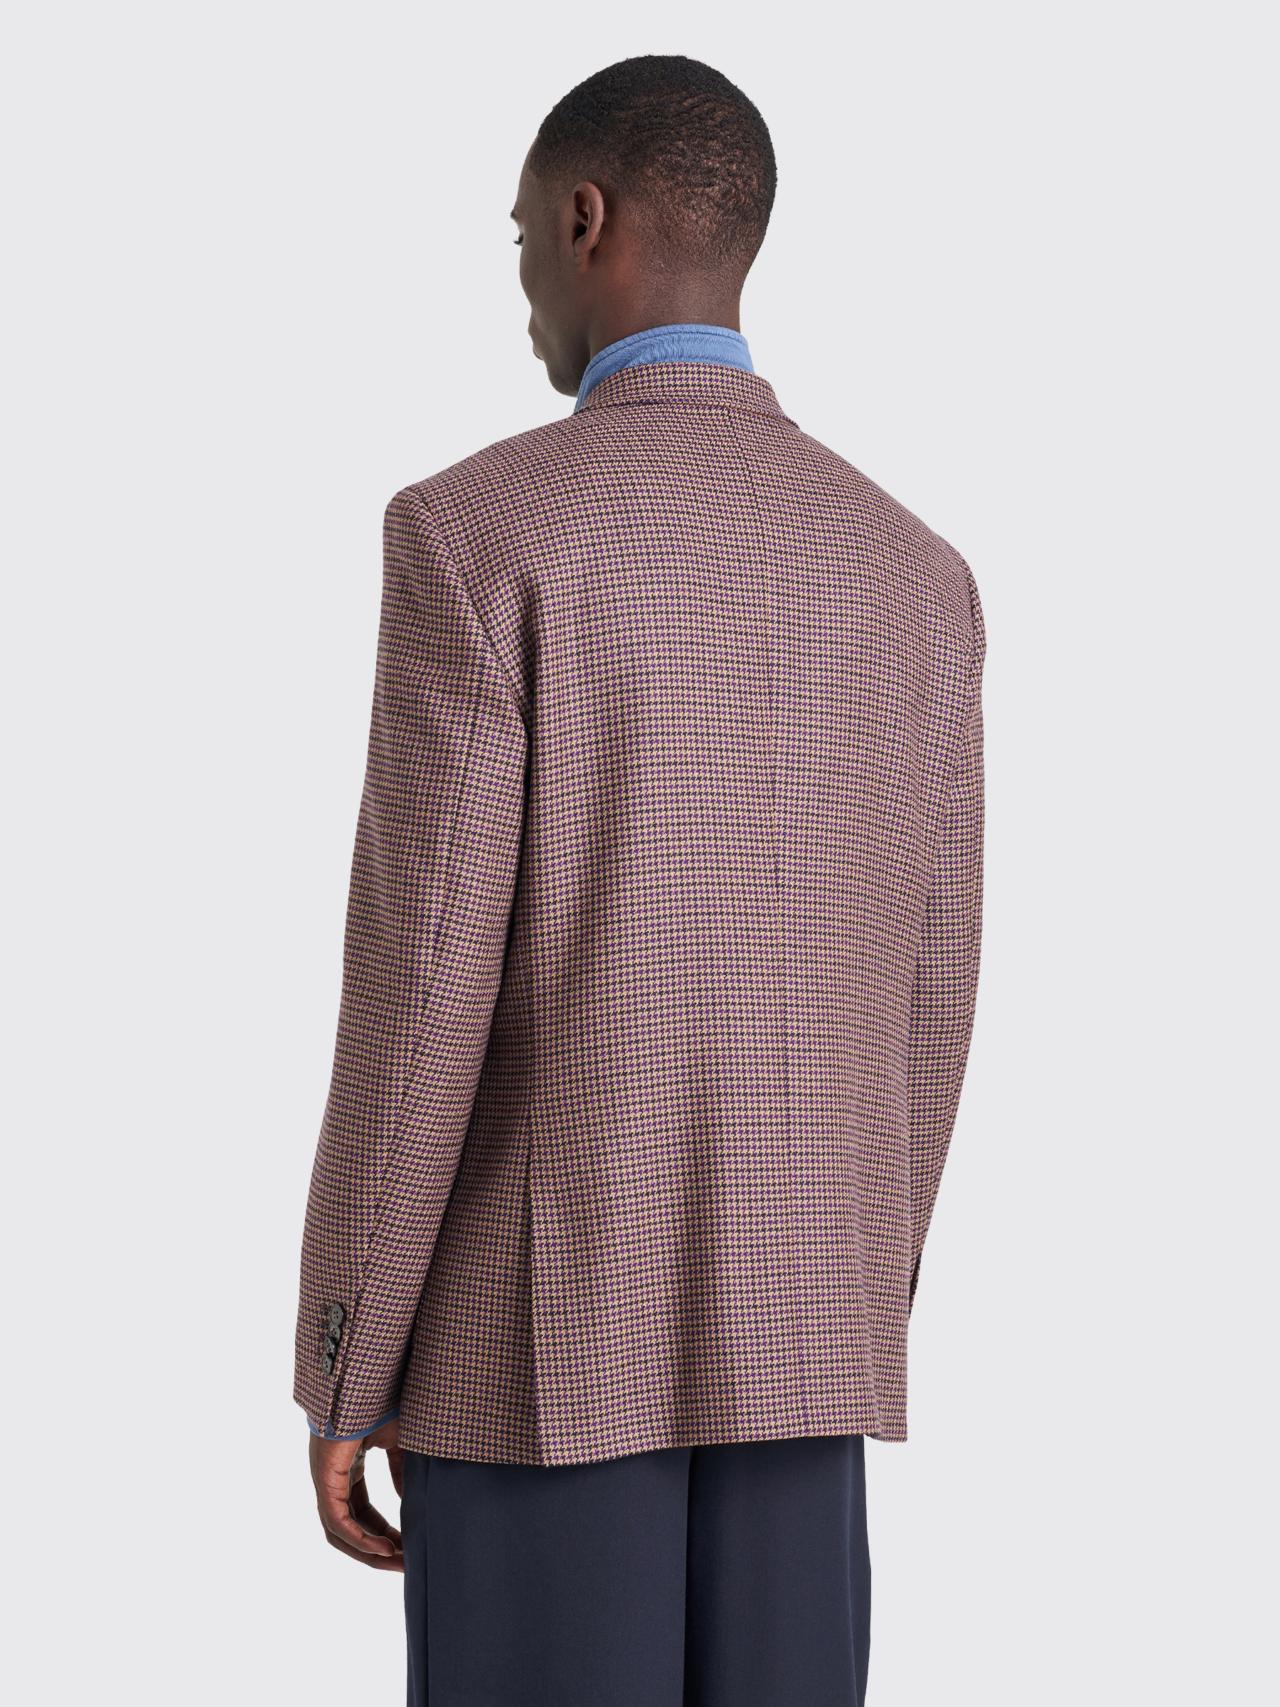 Bureau Bertrand Clément Club Jacket